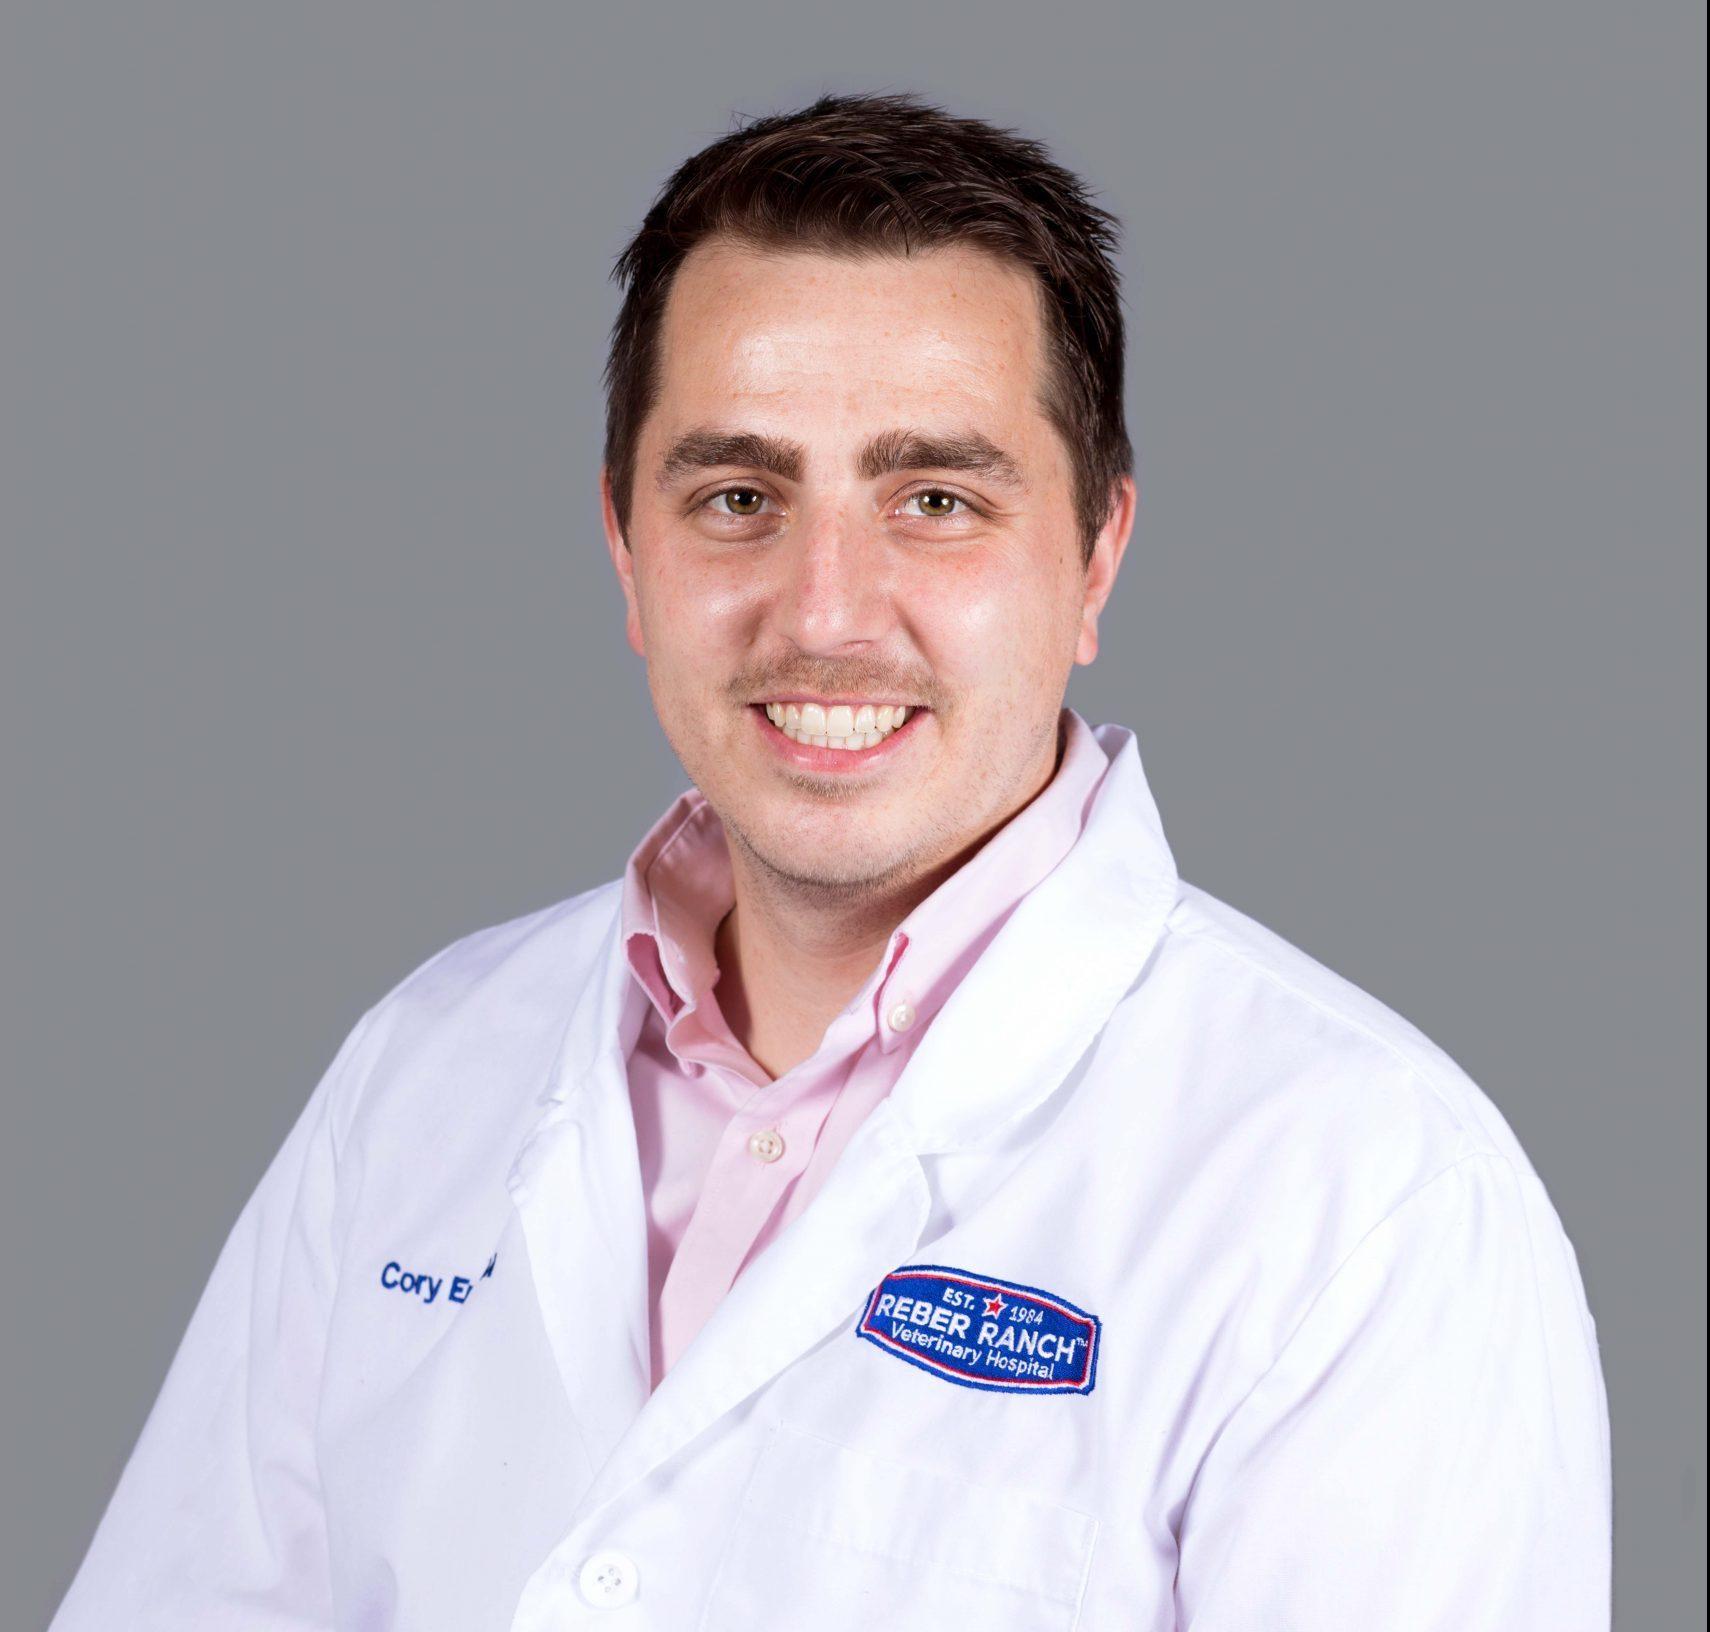 Dr. Cory Erb